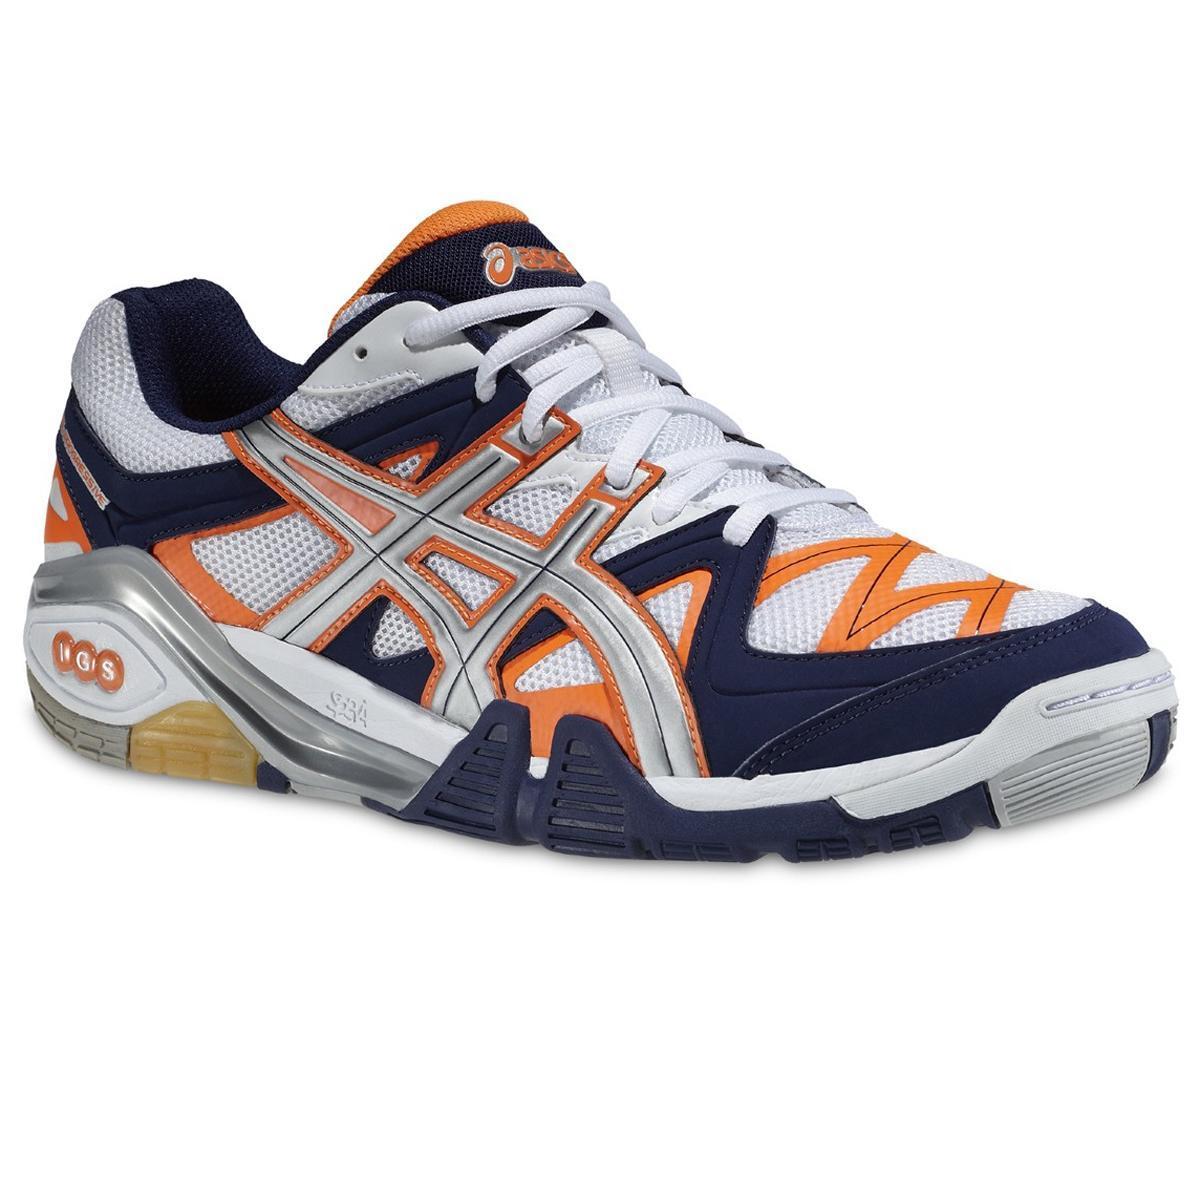 Asics Mens GEL Progressive 2 Indoor Squash Shoes WhiteOrange